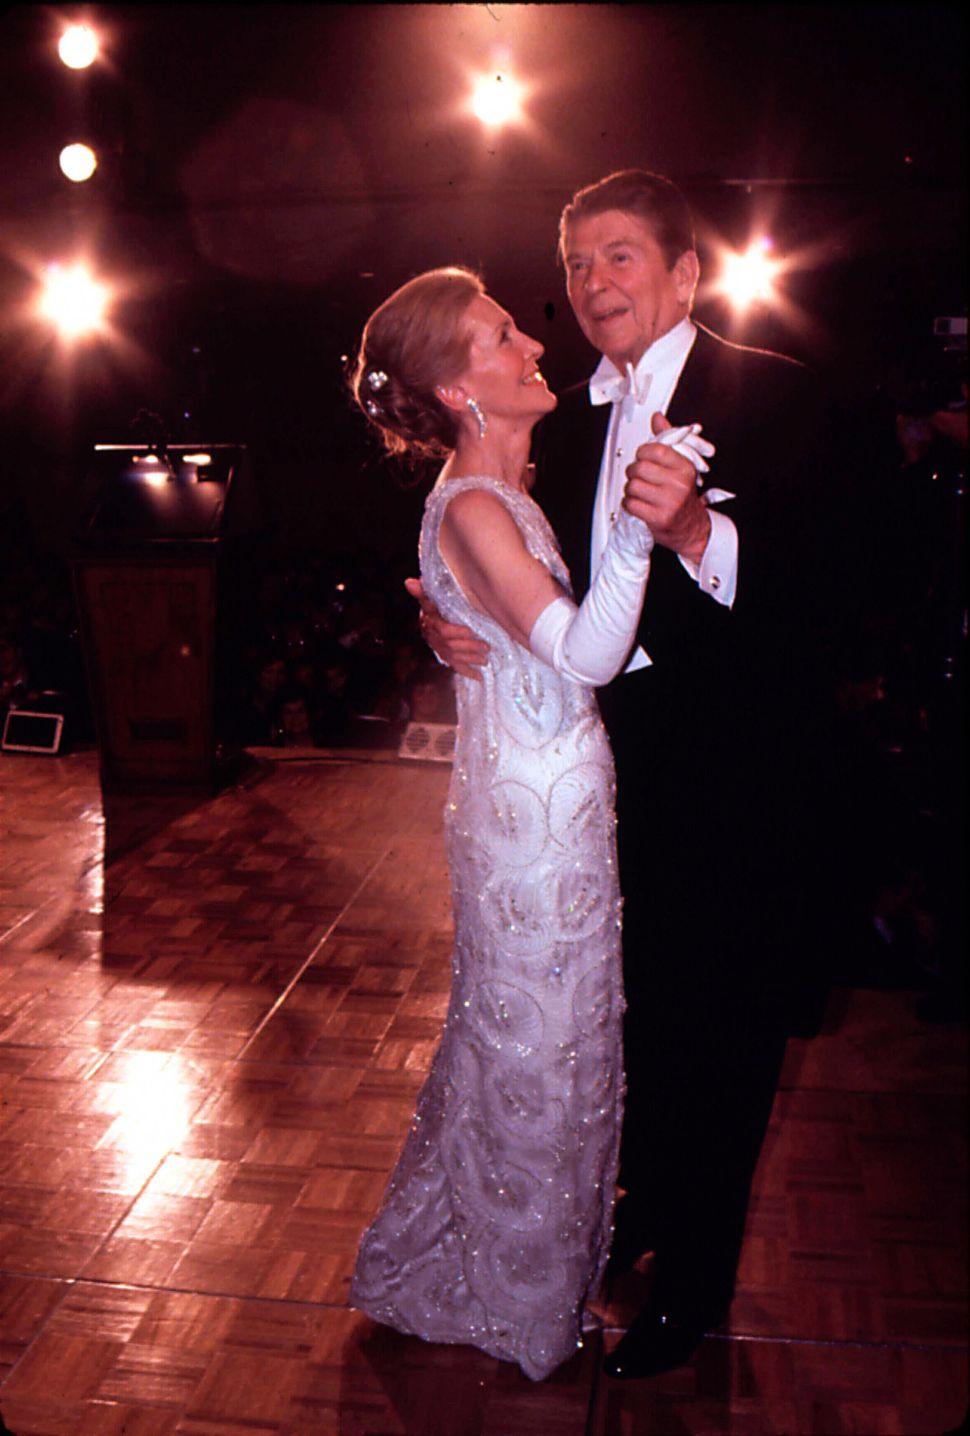 Ronald Reagan dancing with his wife Nancy at his Inaugural Ball on Jan. 20, 1981